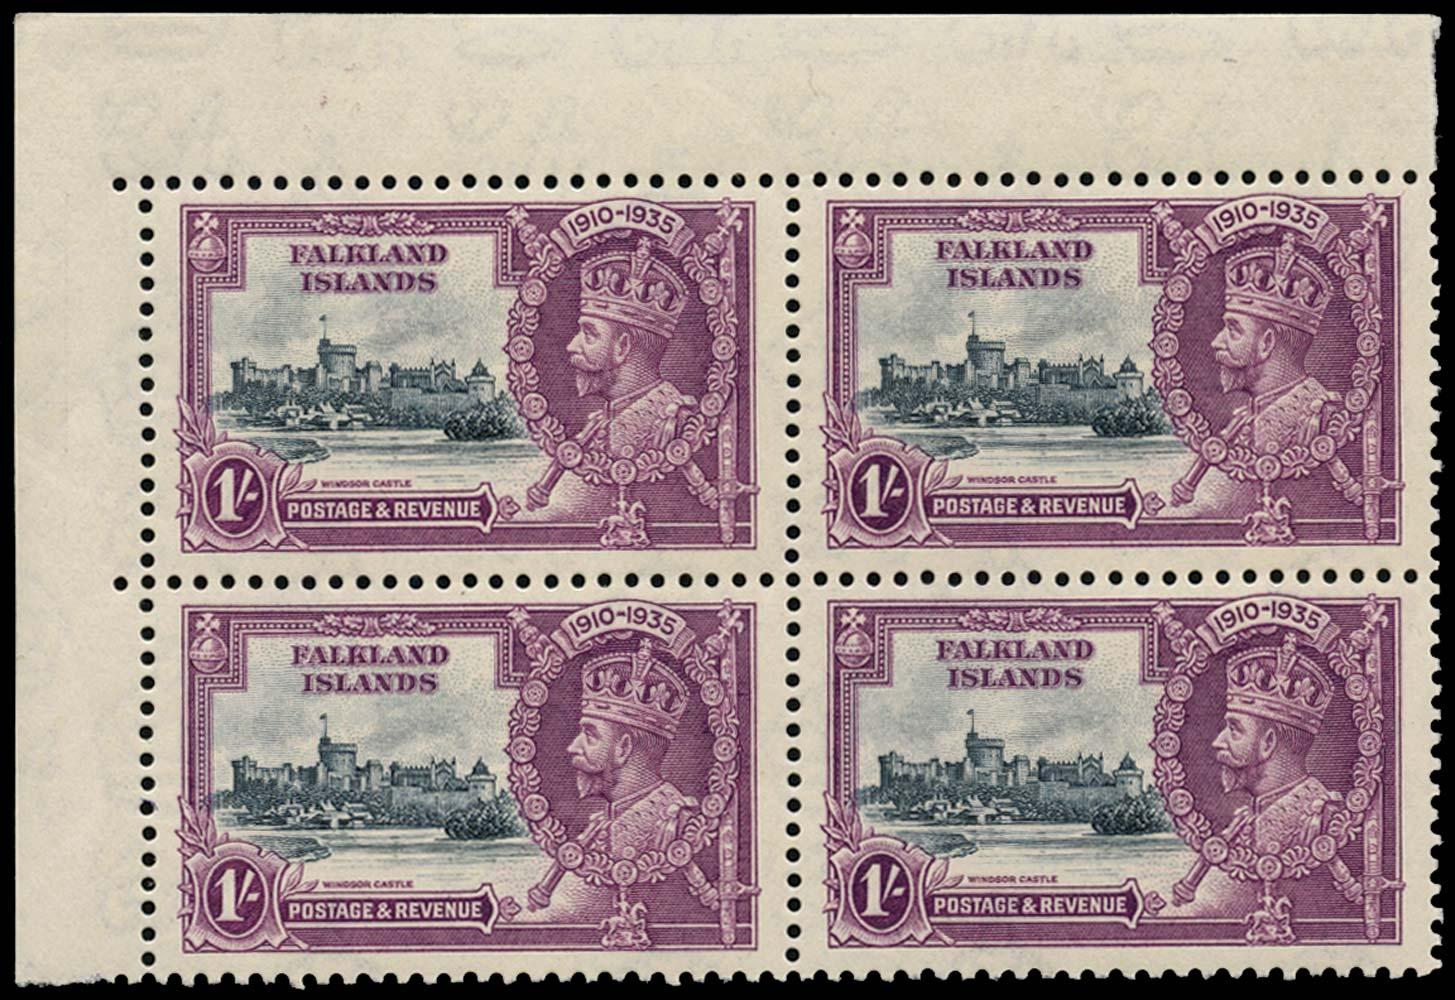 FALKLAND ISLANDS 1935  SG142b Mint 1s Short extra flagstaff